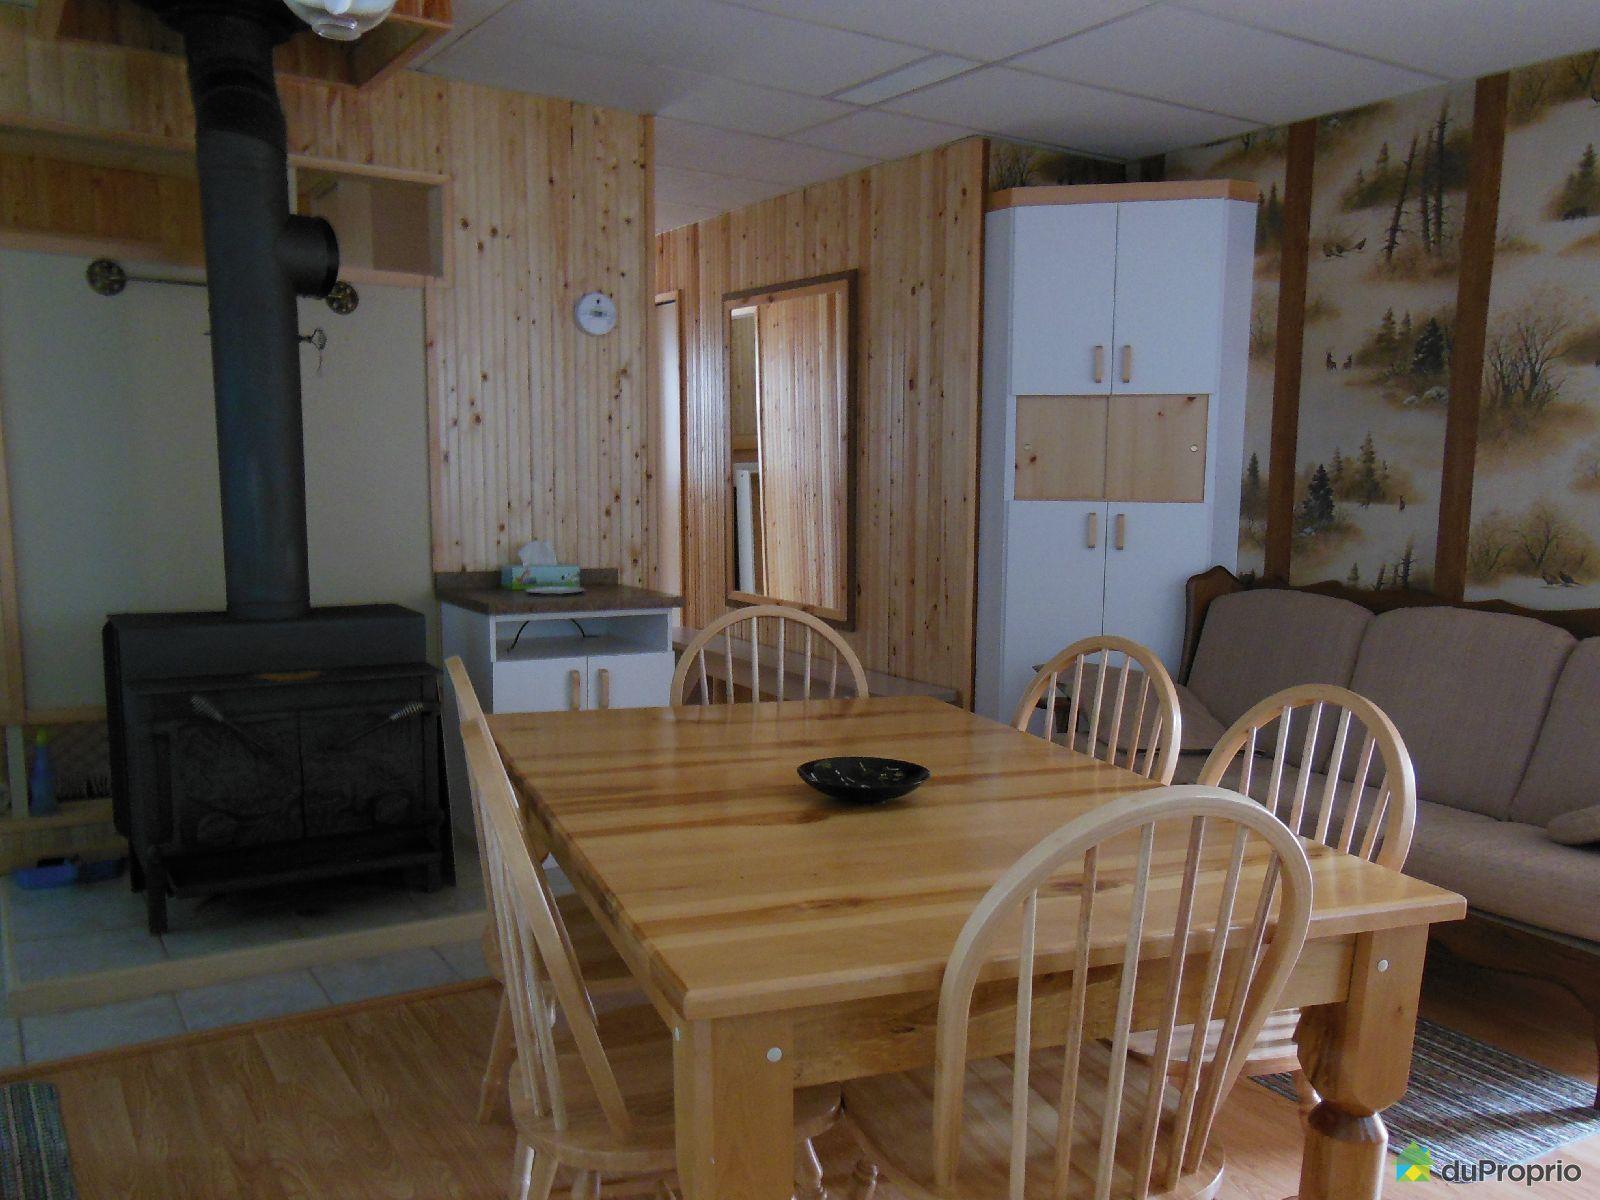 meuble tv a vendre saguenay artzeincom - Meuble Tv A Vendre Saguenay